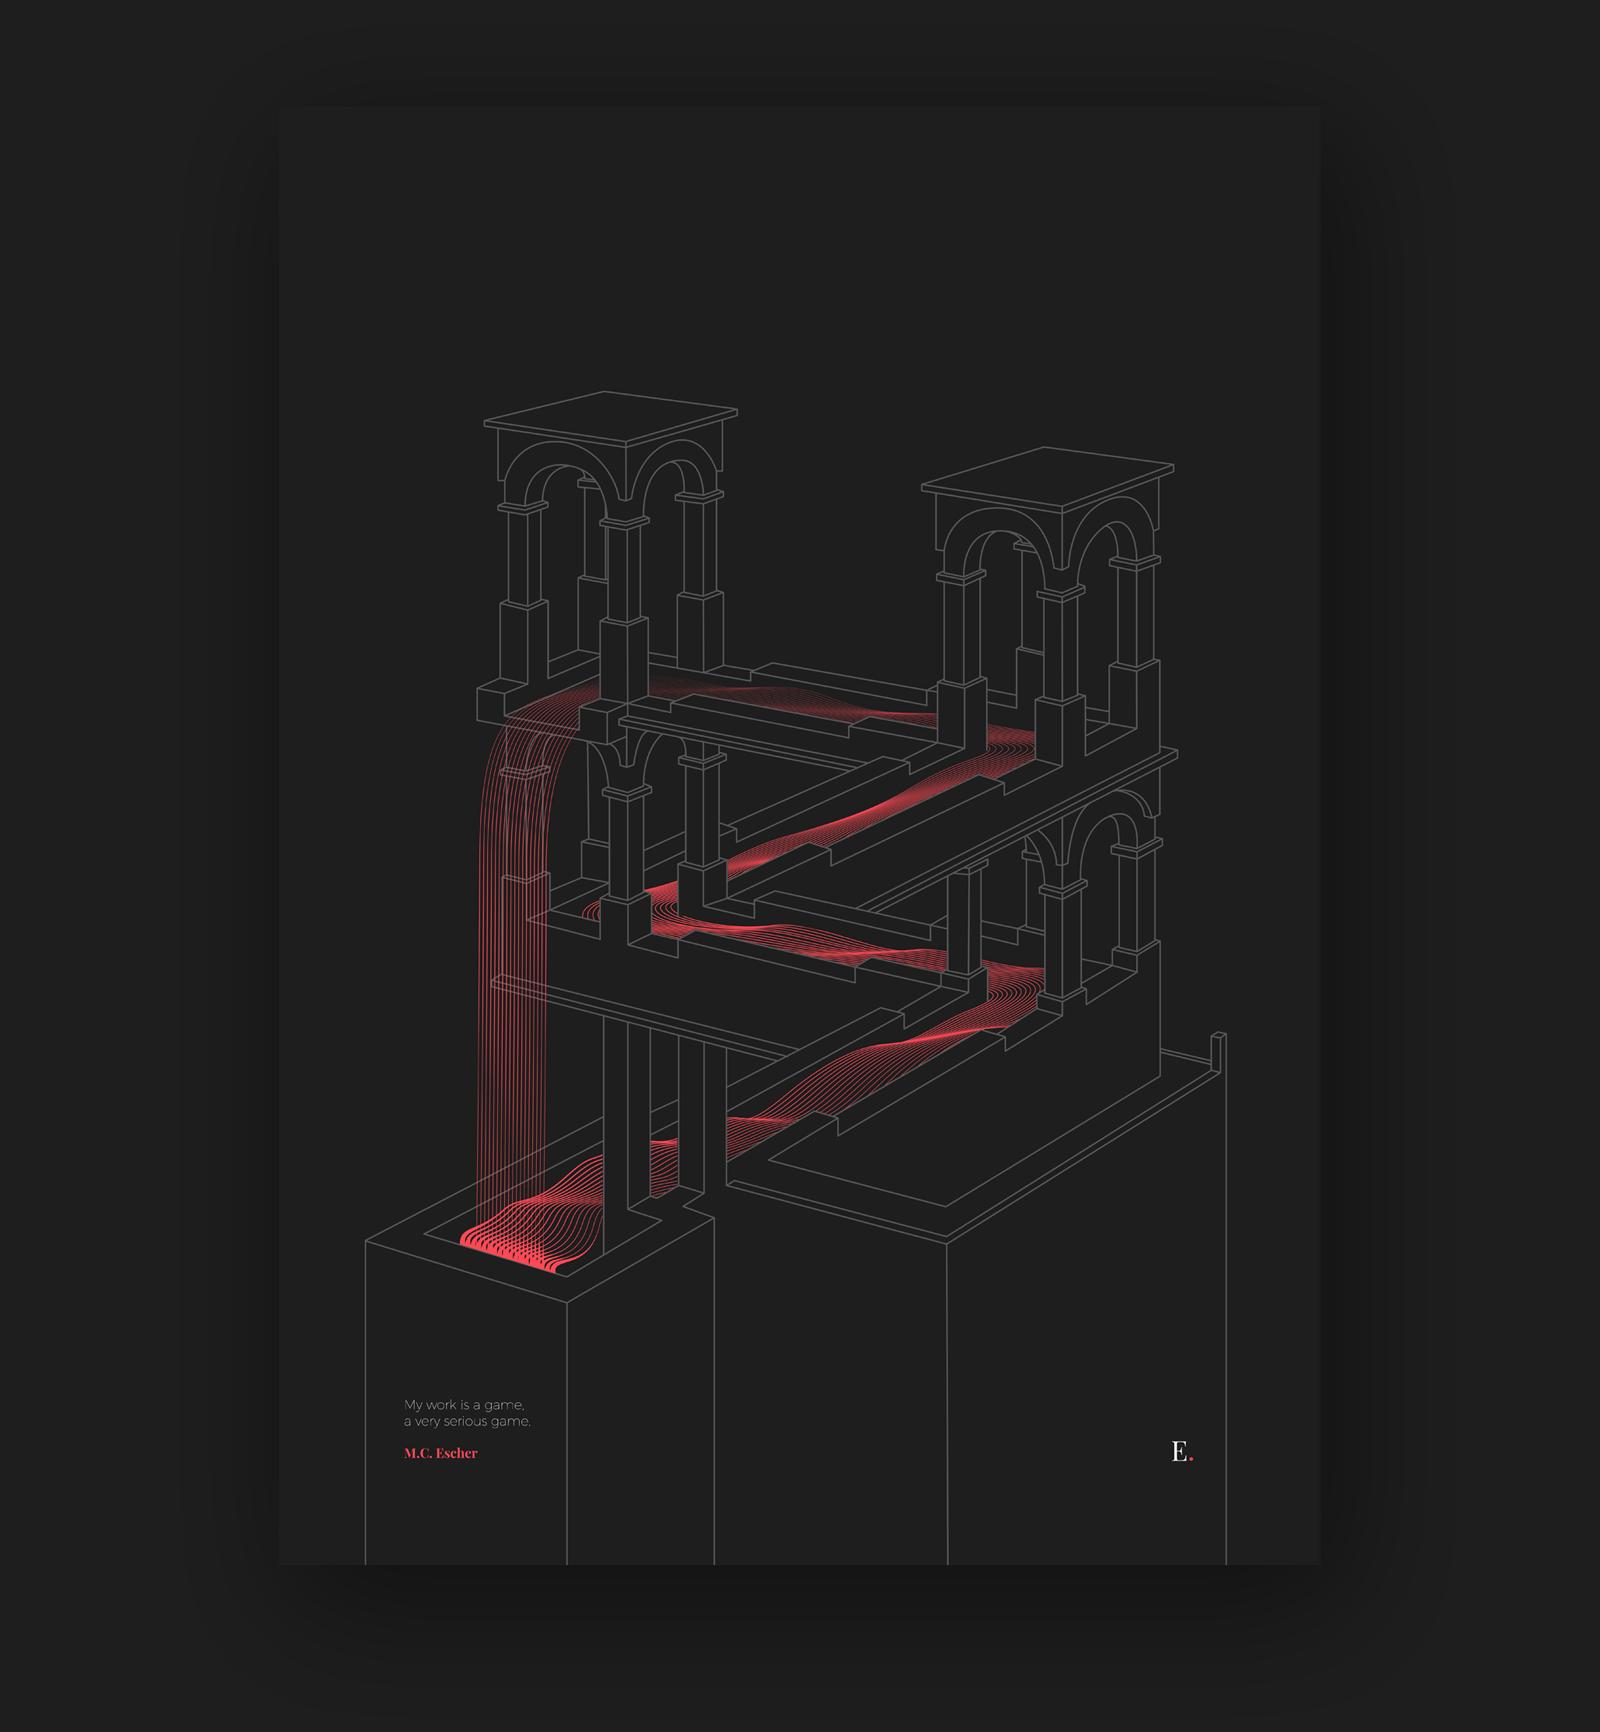 Tribute to Escher - 4